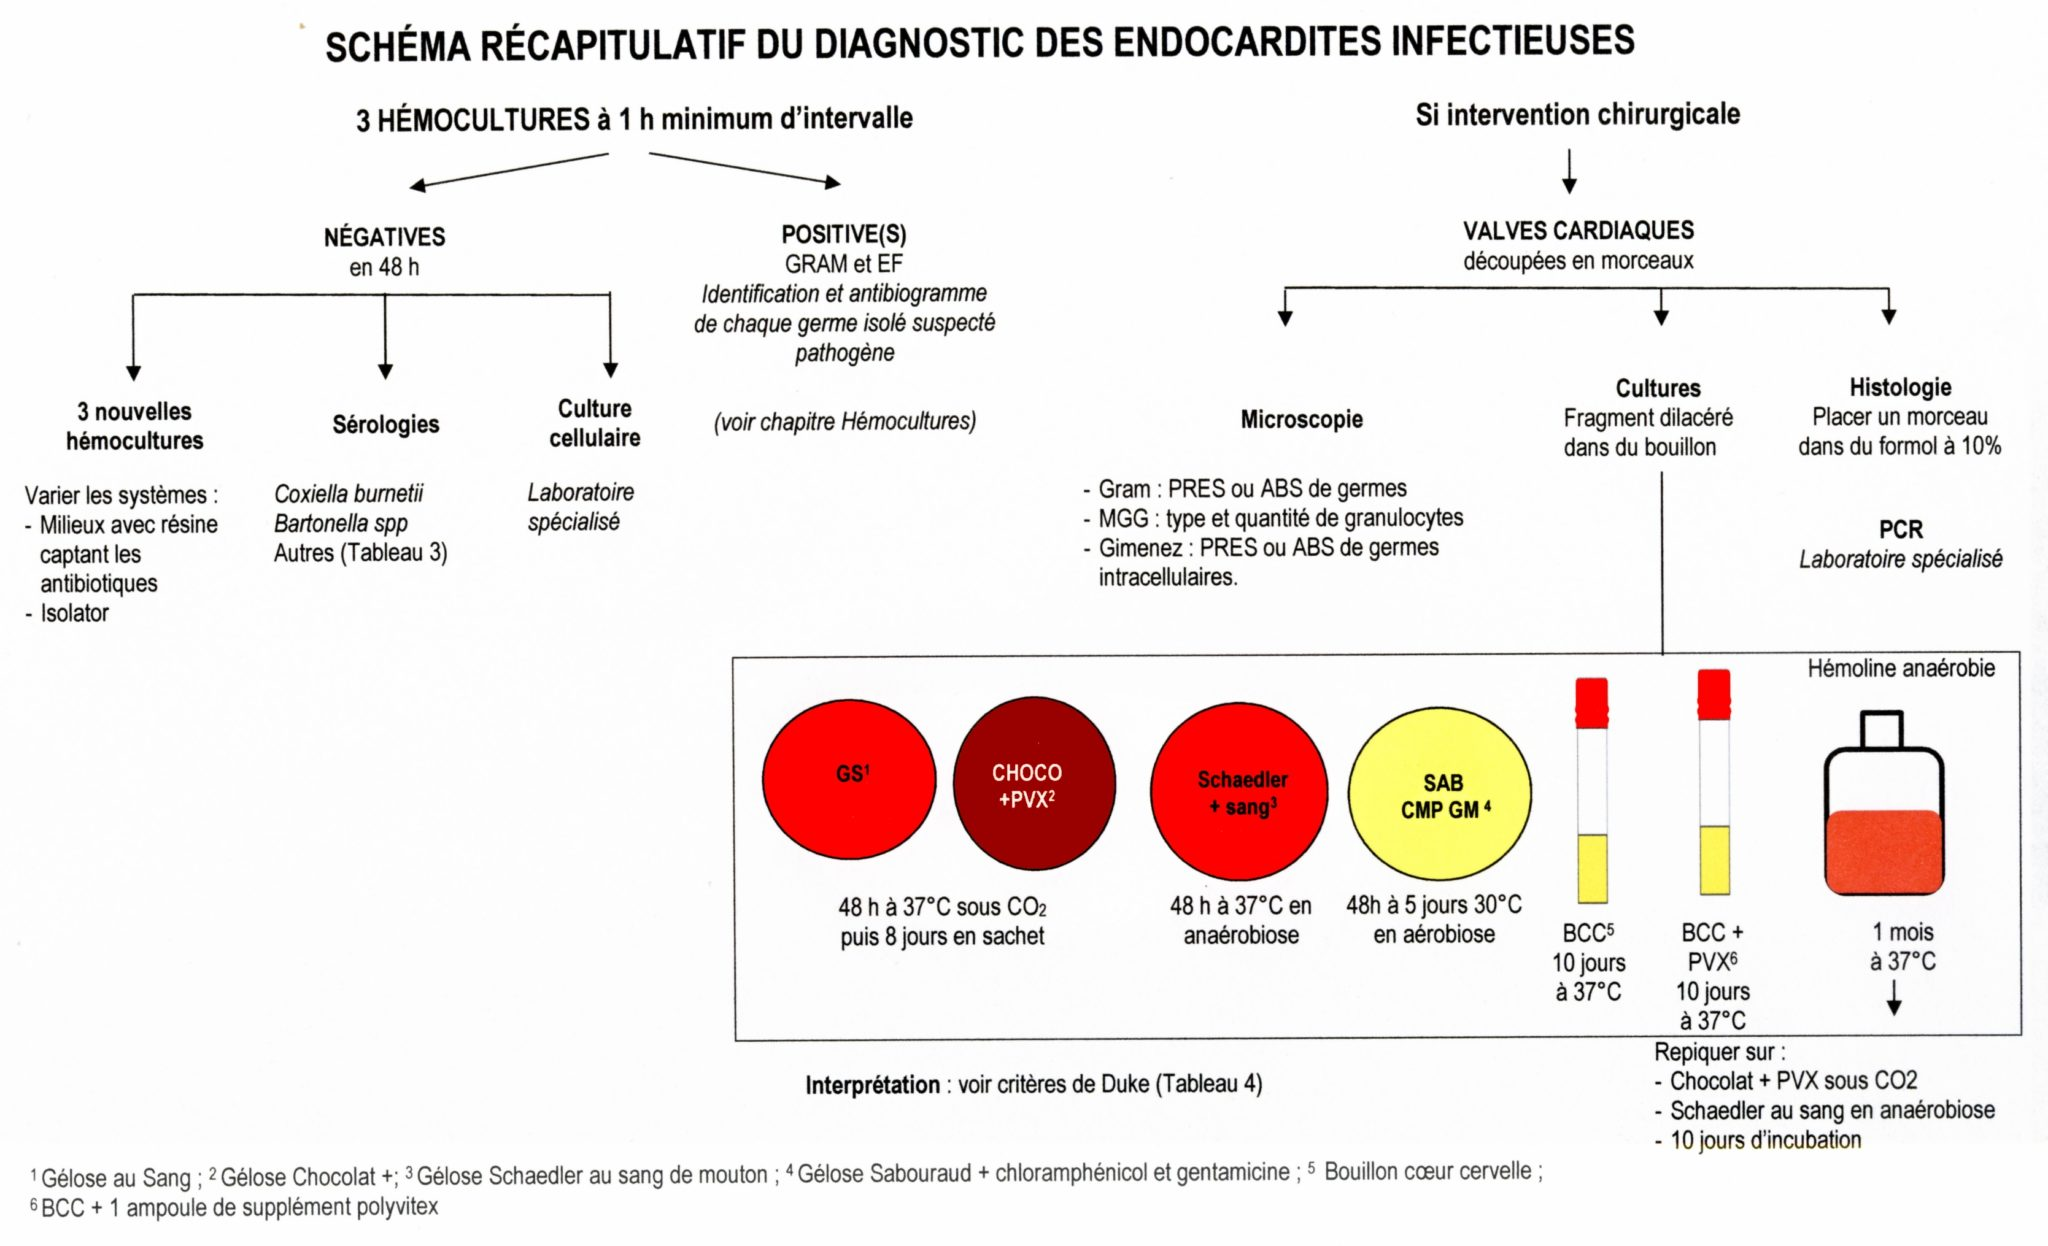 endocardites